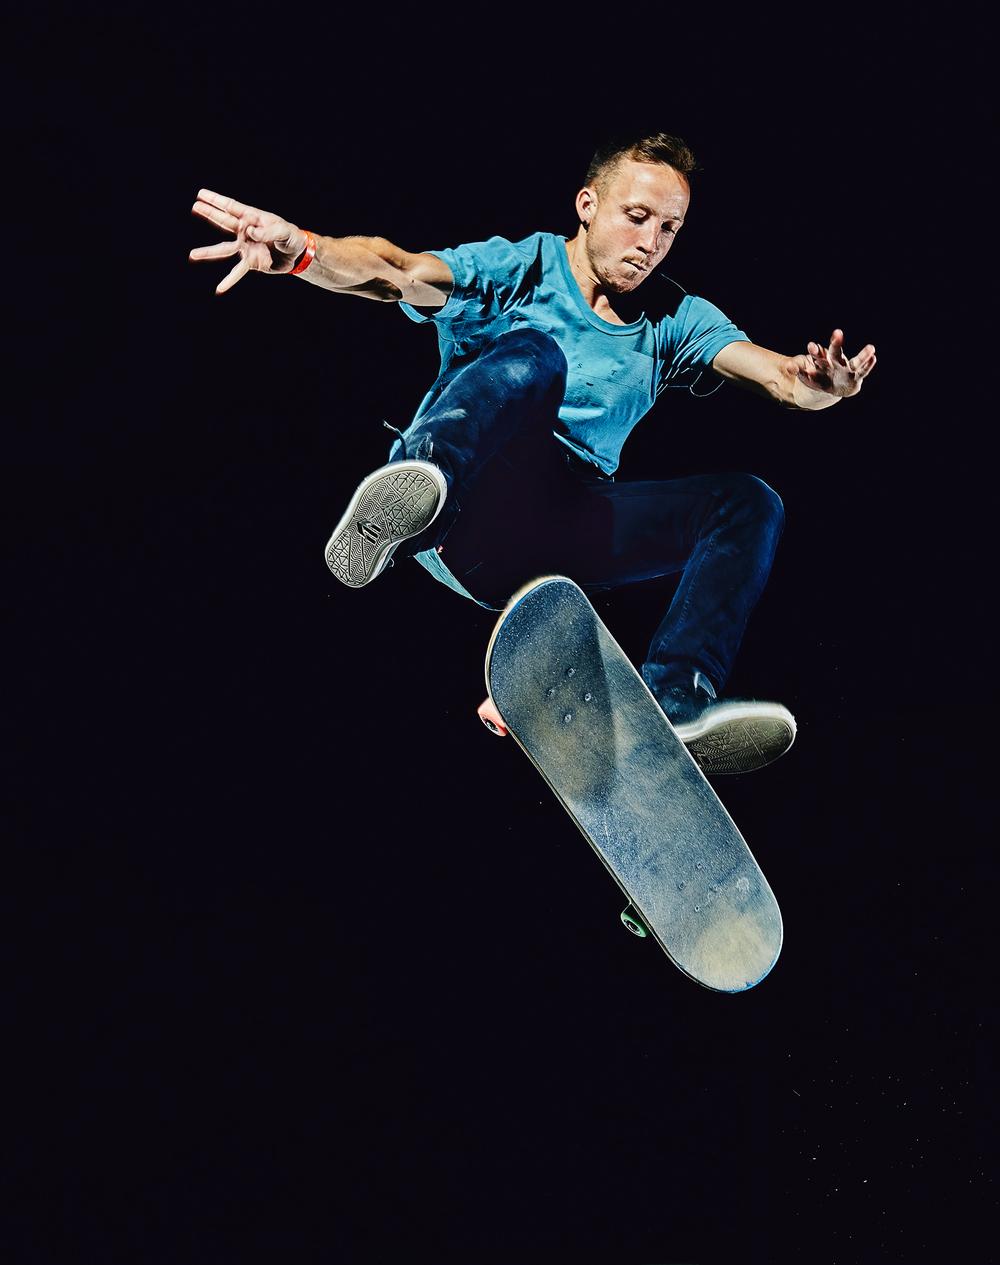 2016_Brandon-Tigrett_Scottsdale_McDowell-Skateboarders-62_Retouched_WEB_Portfolio.jpg